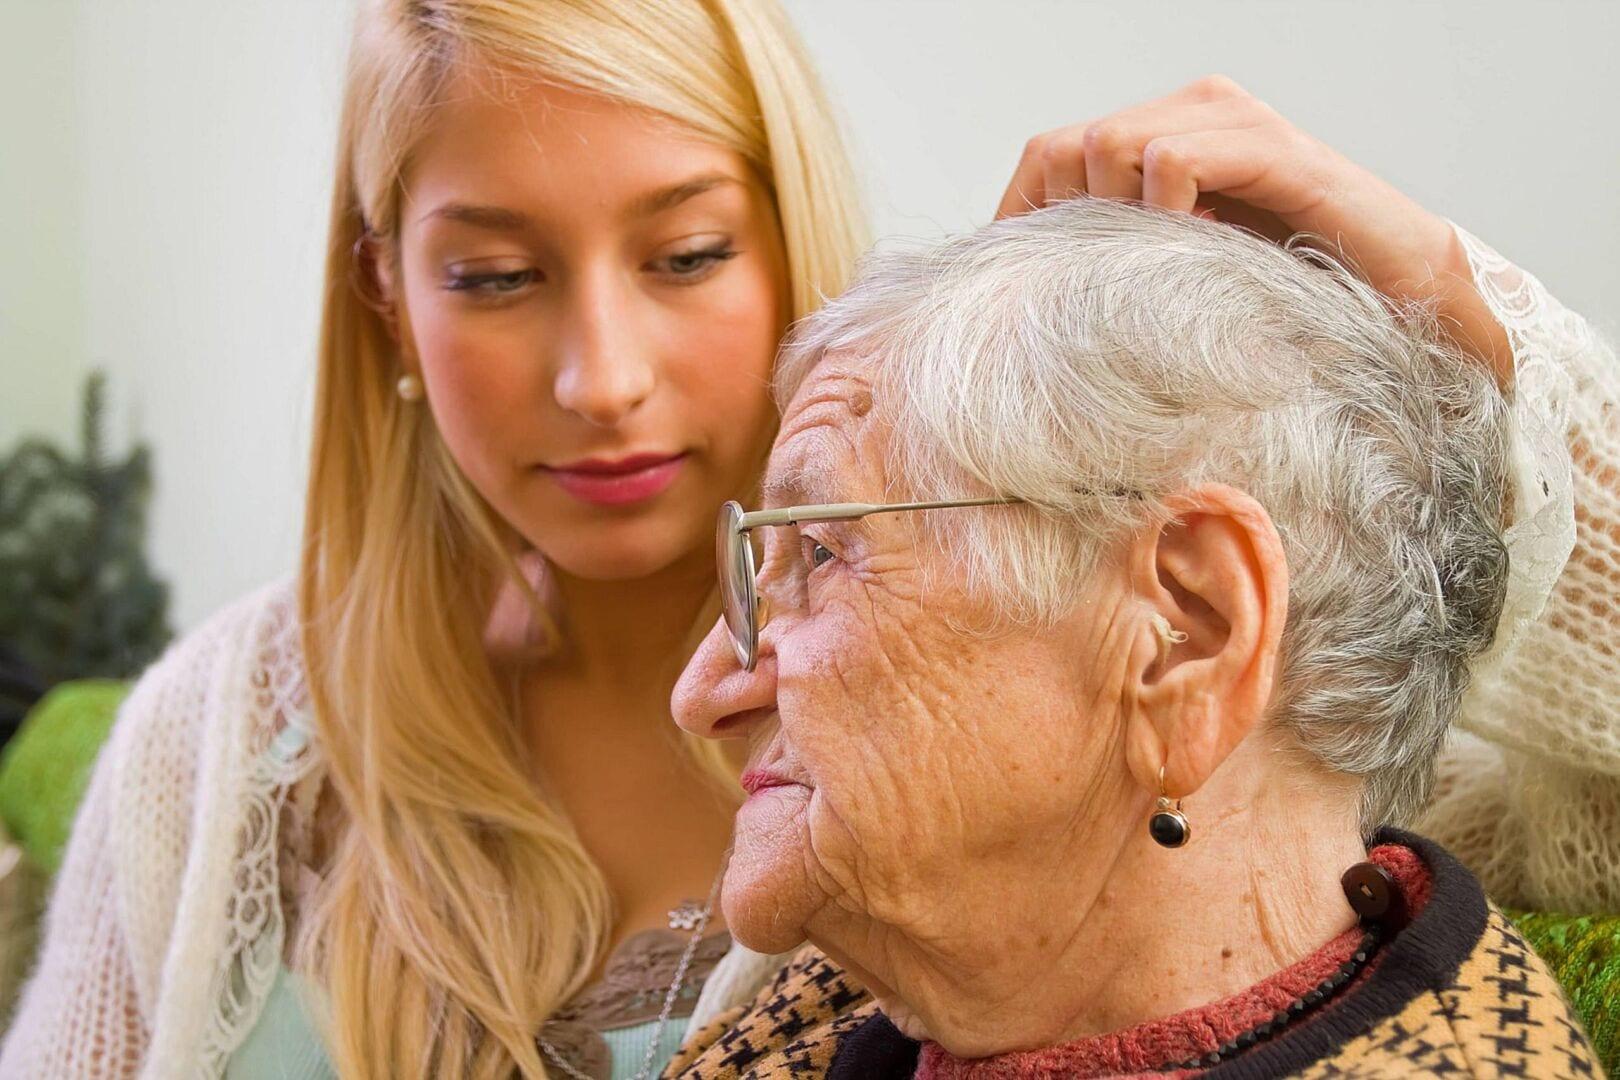 Garland Nursing Home Abuse & Negligence Lawyer